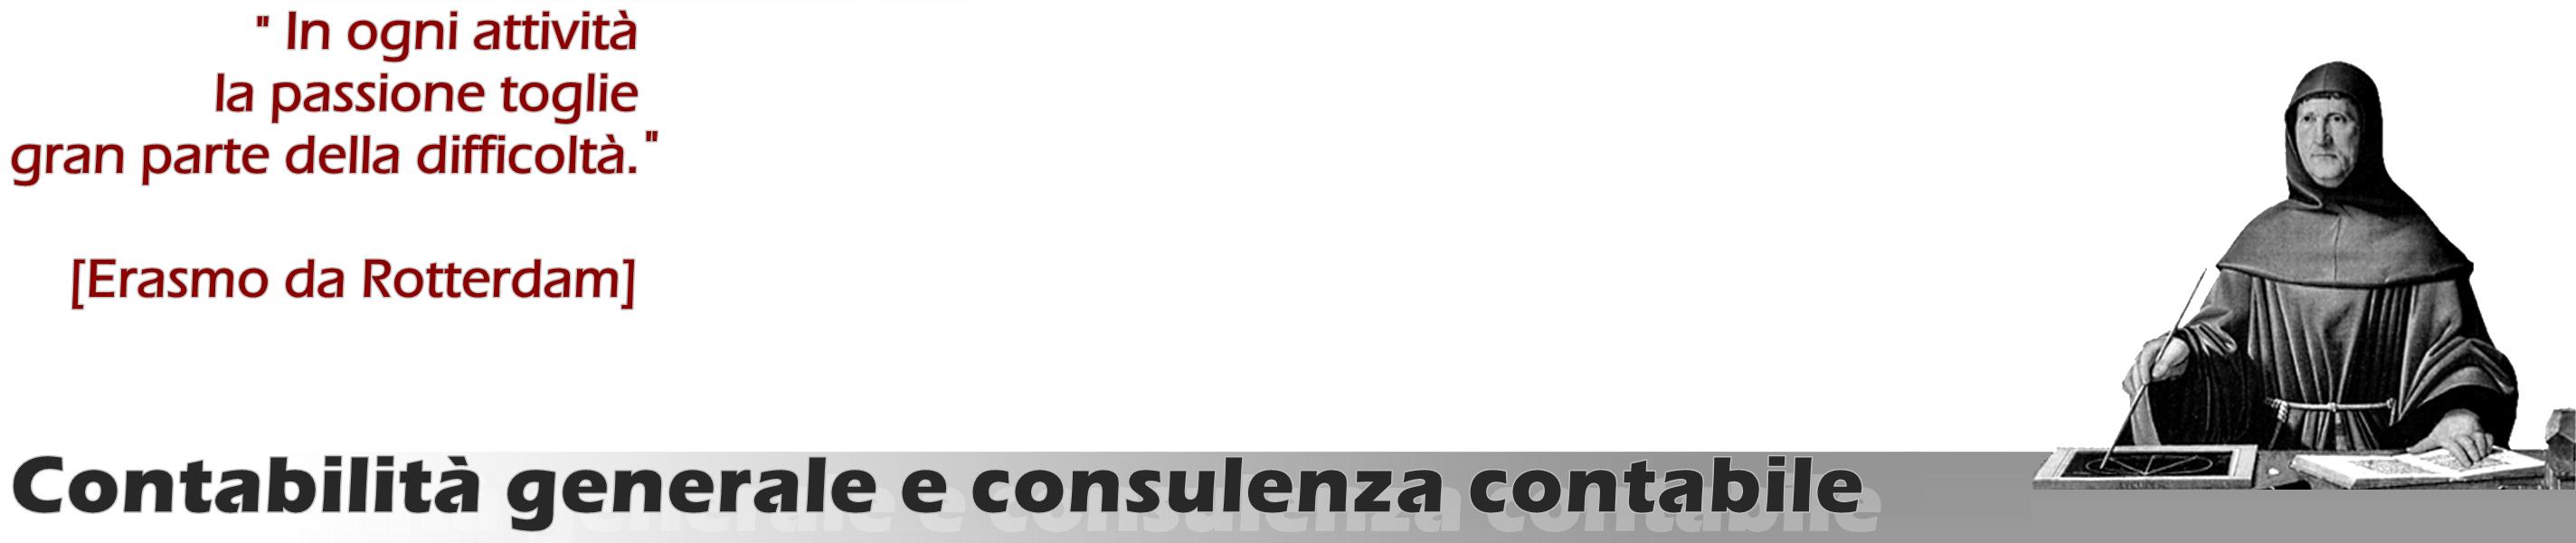 1-contabilita-generale